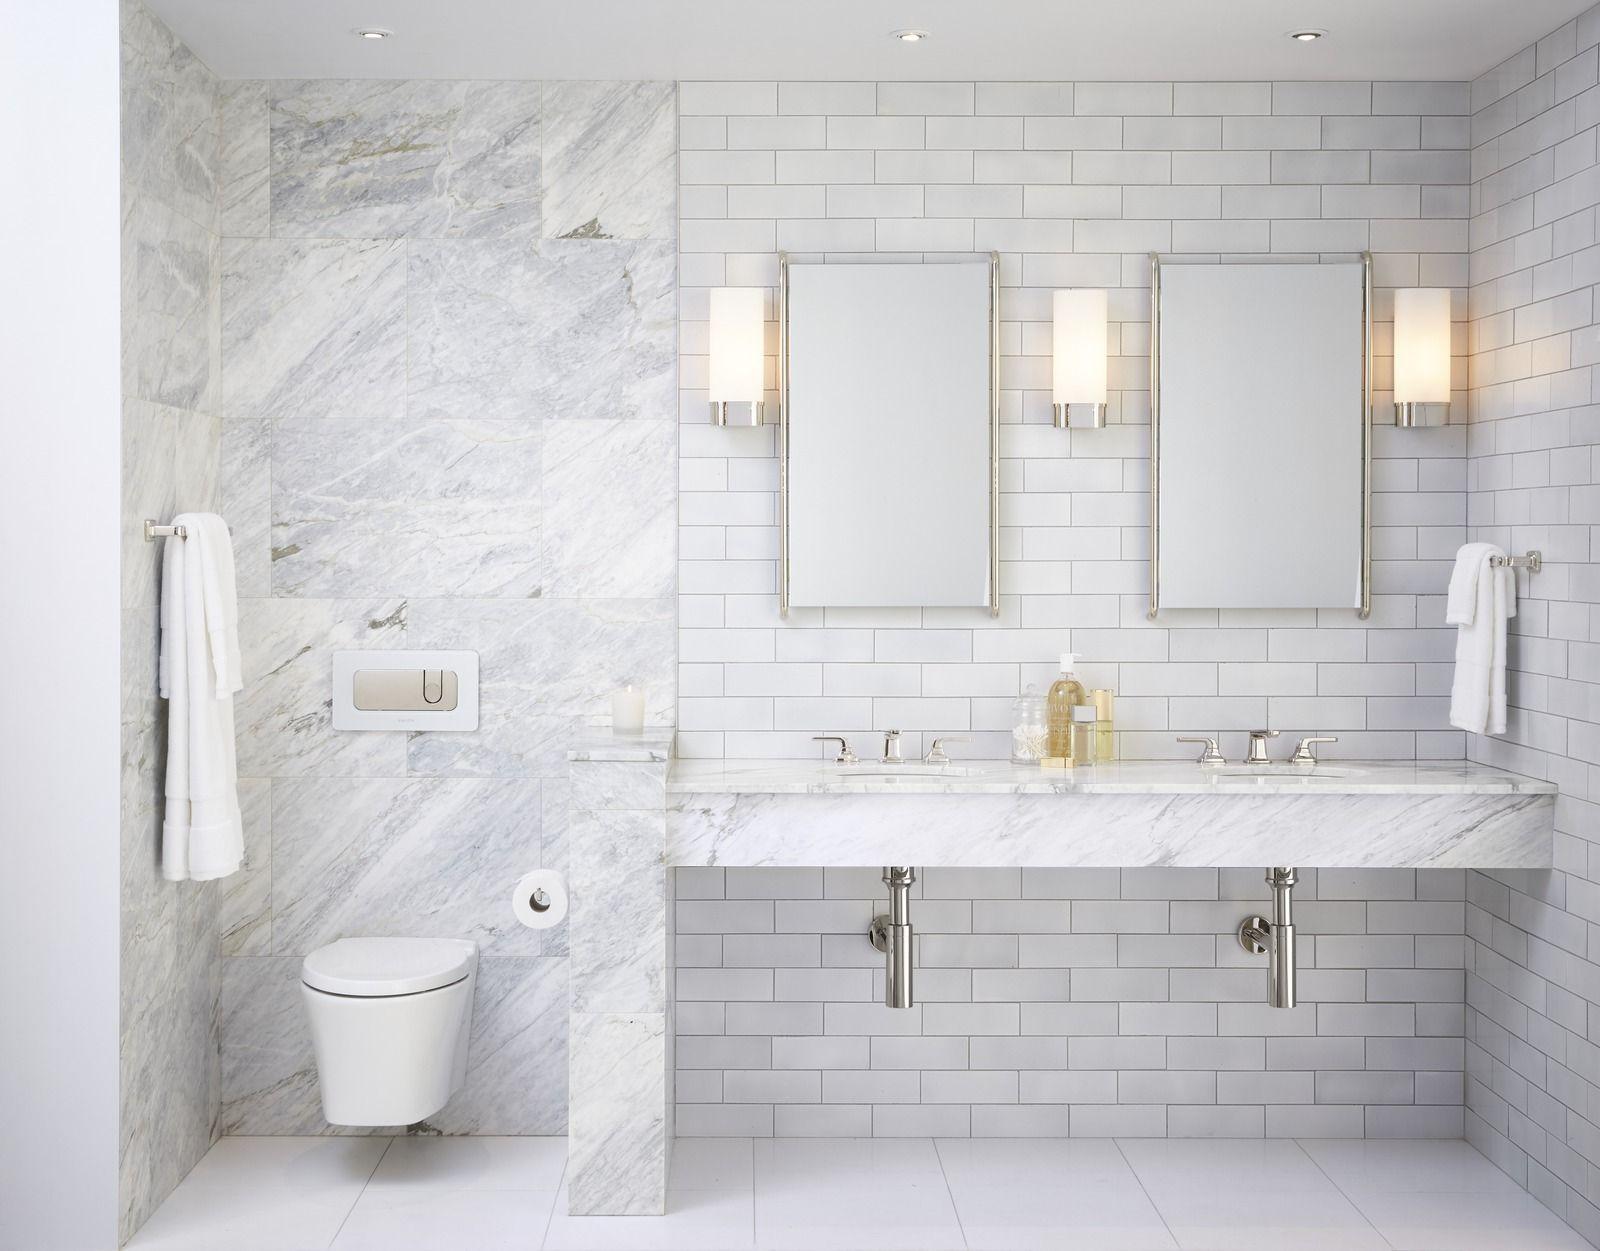 House Bathroom MirrorsBathroom Pin by